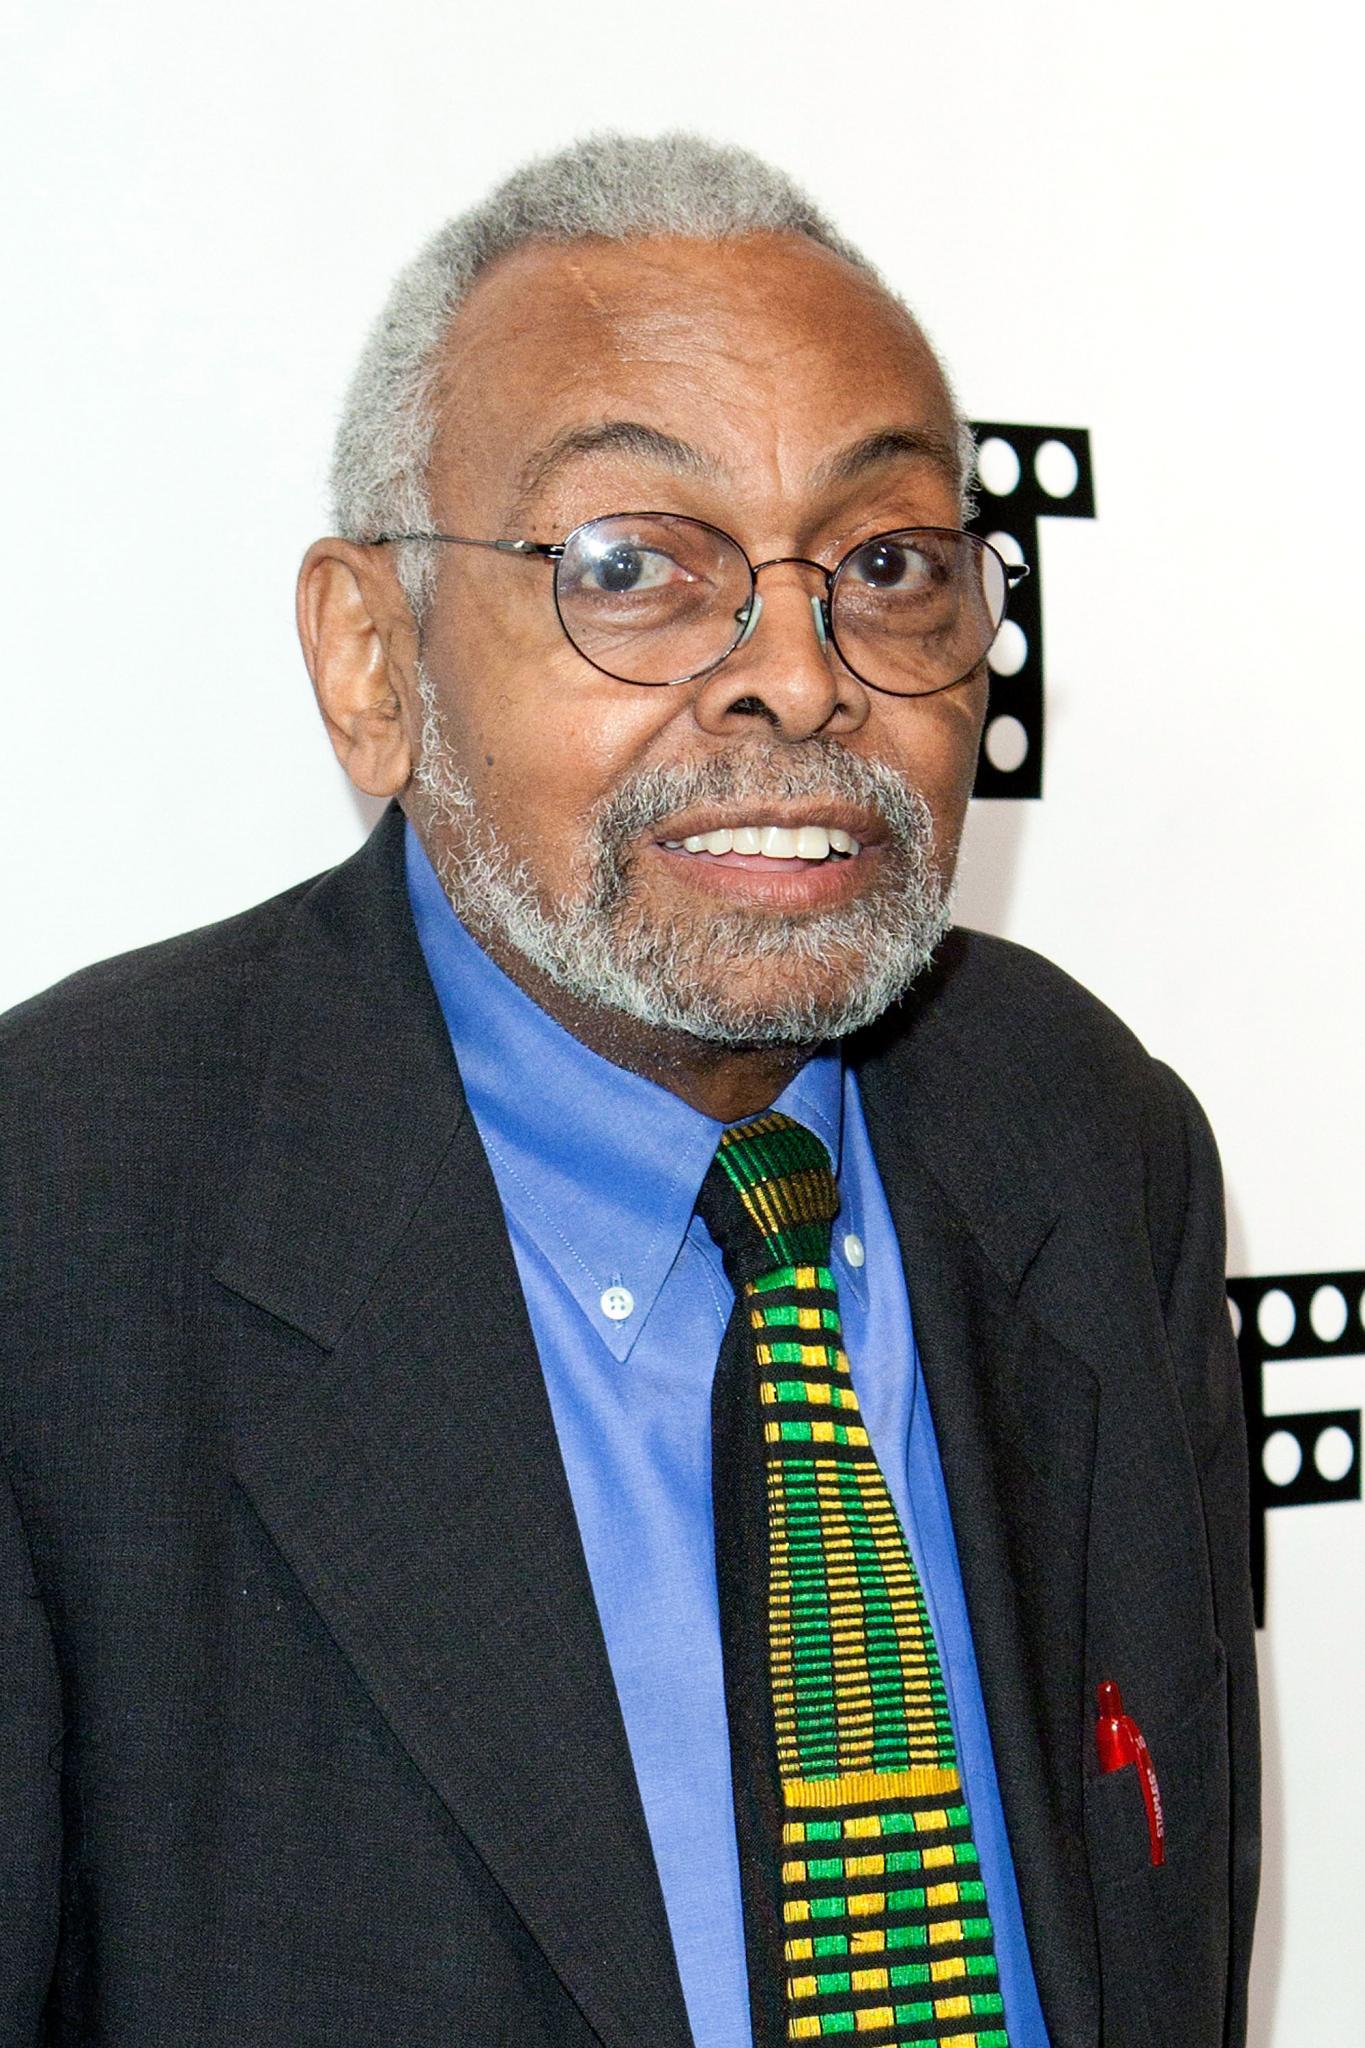 Author, Poet and Activist Amiri Baraka Passes On at 79